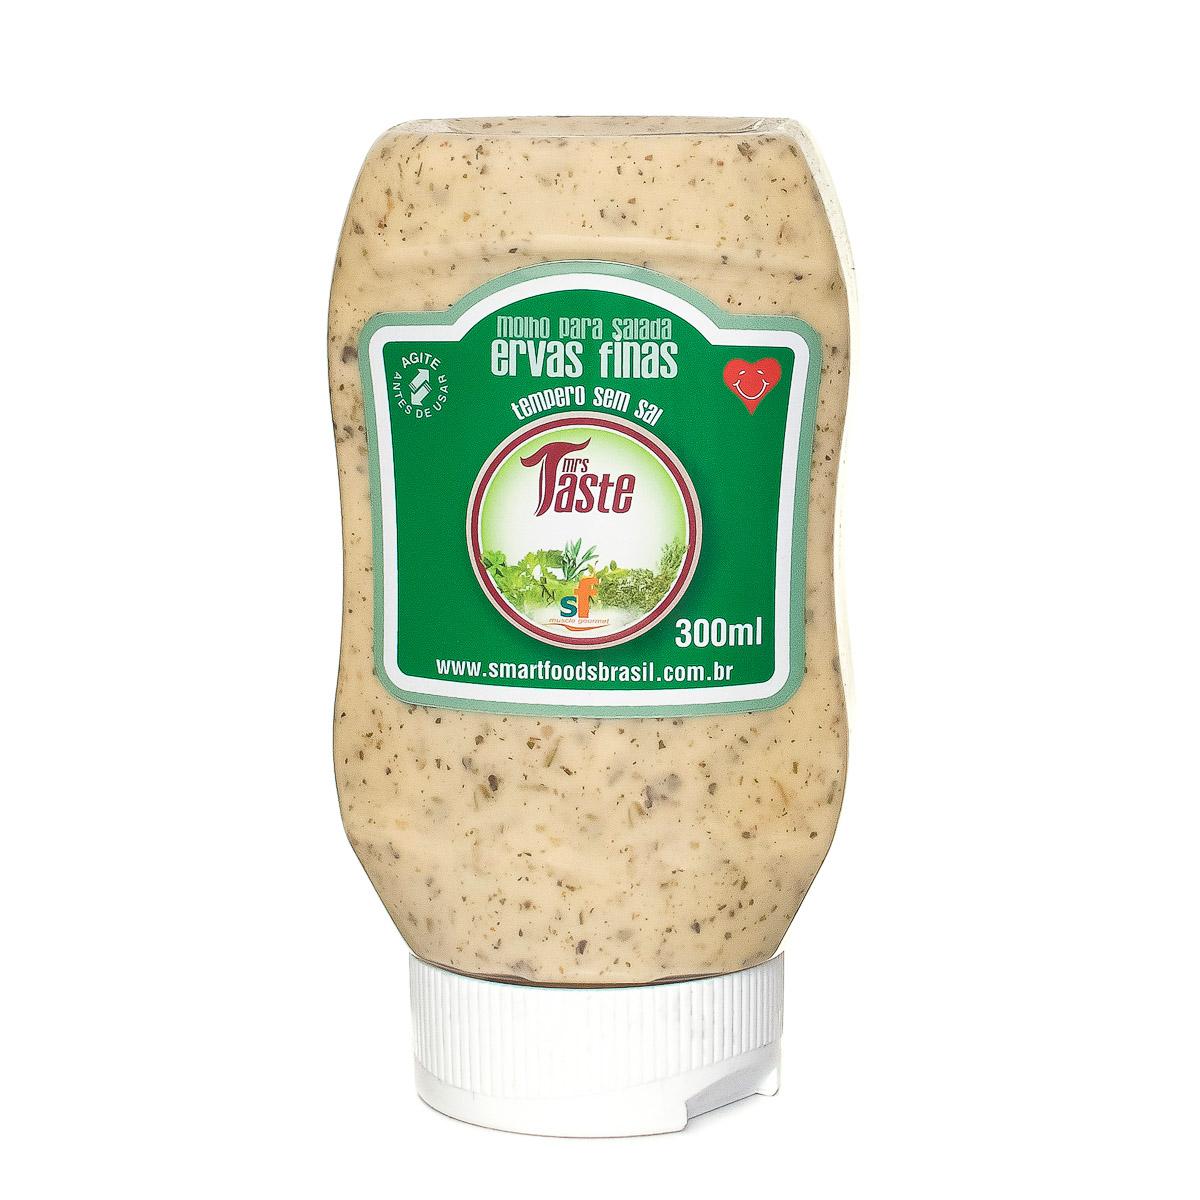 Molho para Salada Sabor Ervas Finas Mrs Taste 300ml